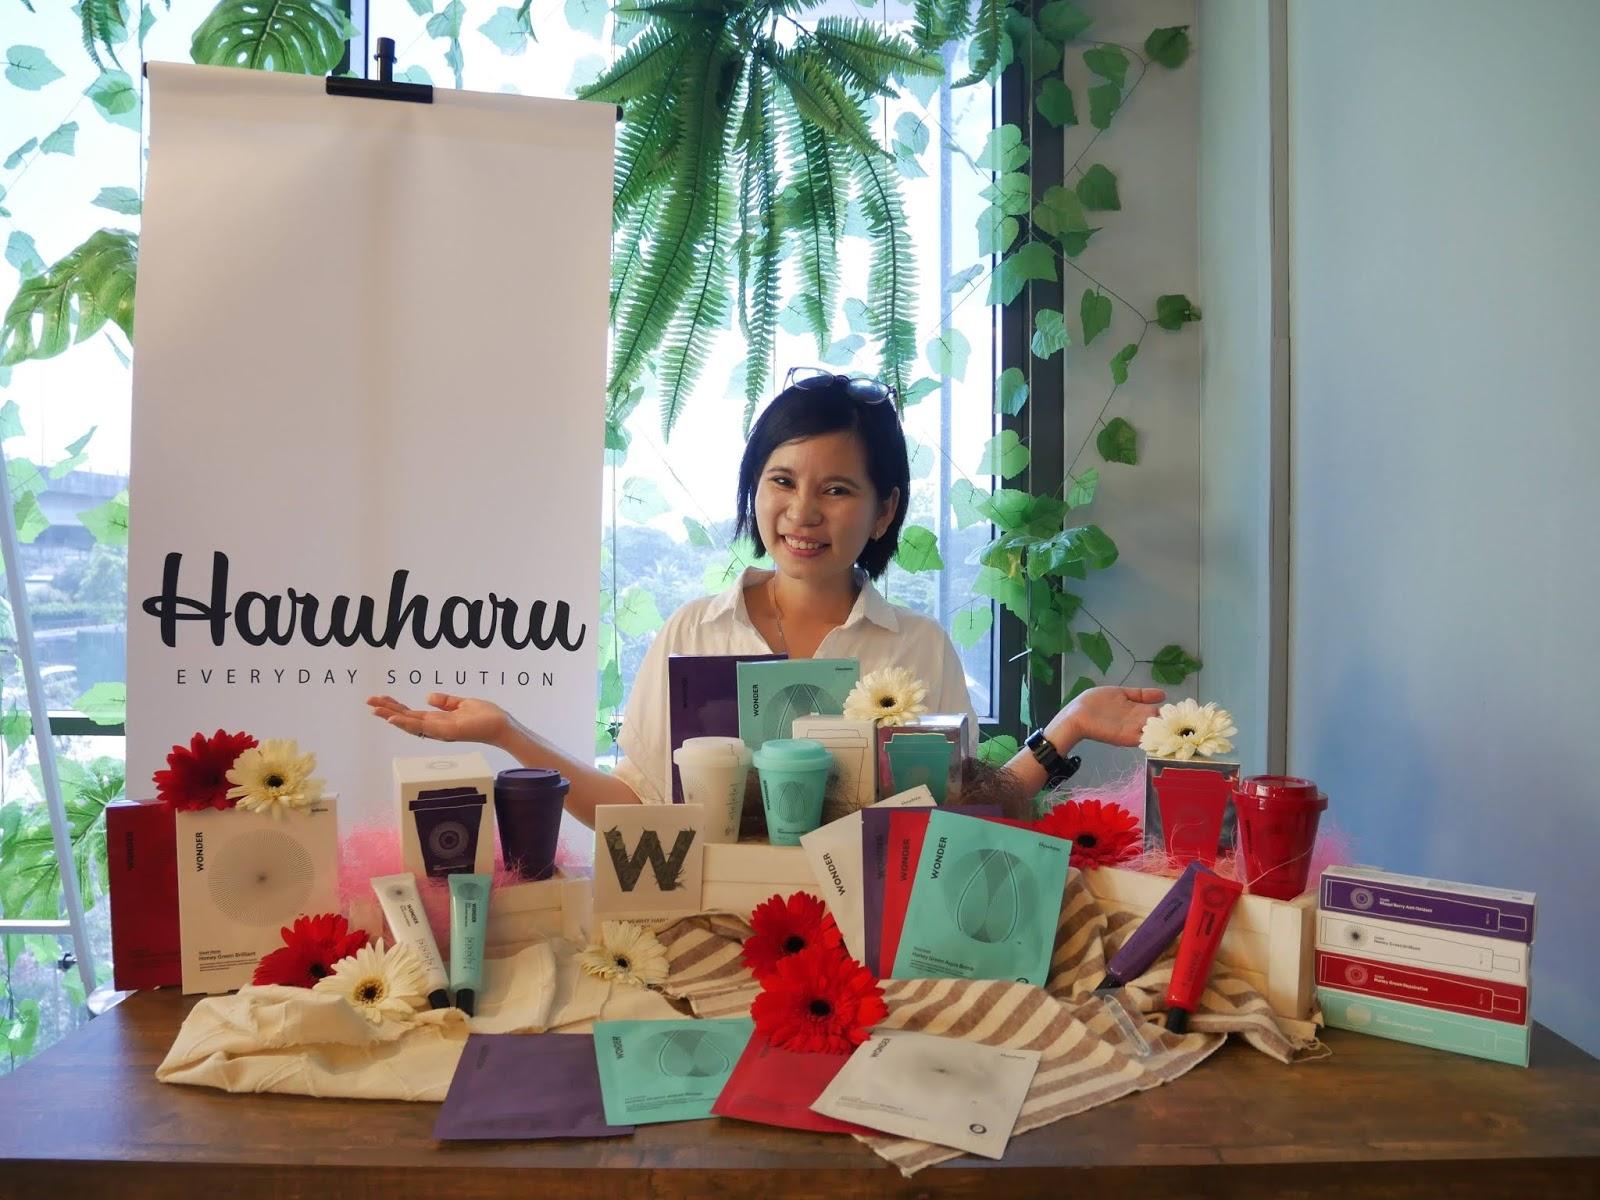 Haruharu Skincare Series - The First Korean Skincare Using